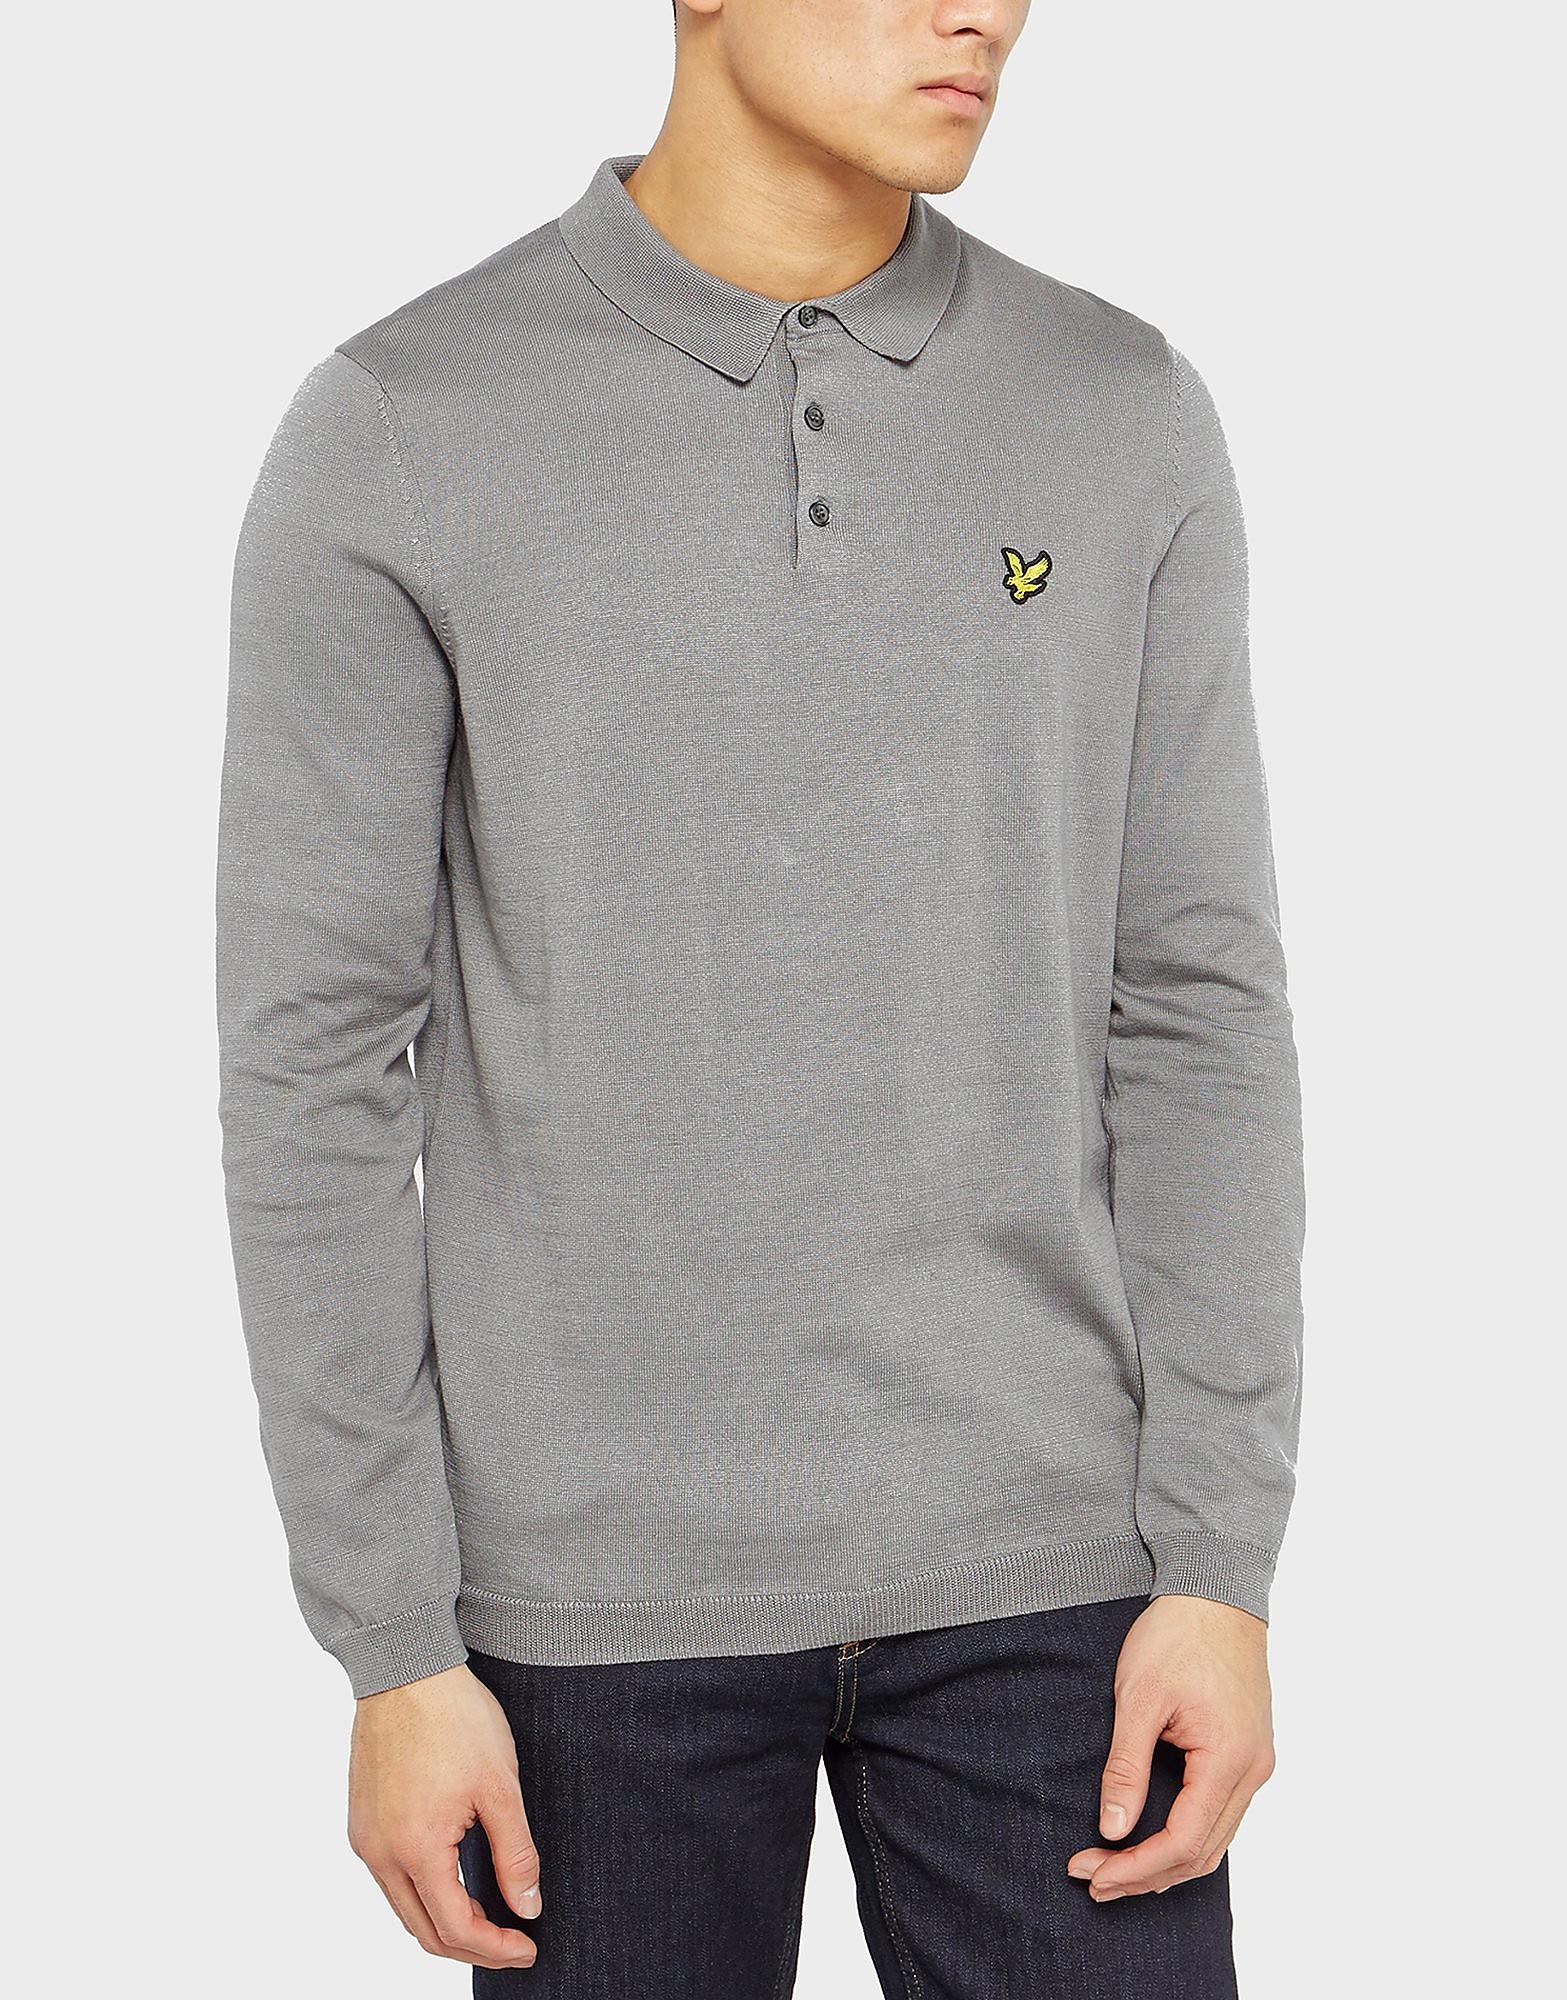 Lyle & Scott Long Sleeve Knit Polo Shirt